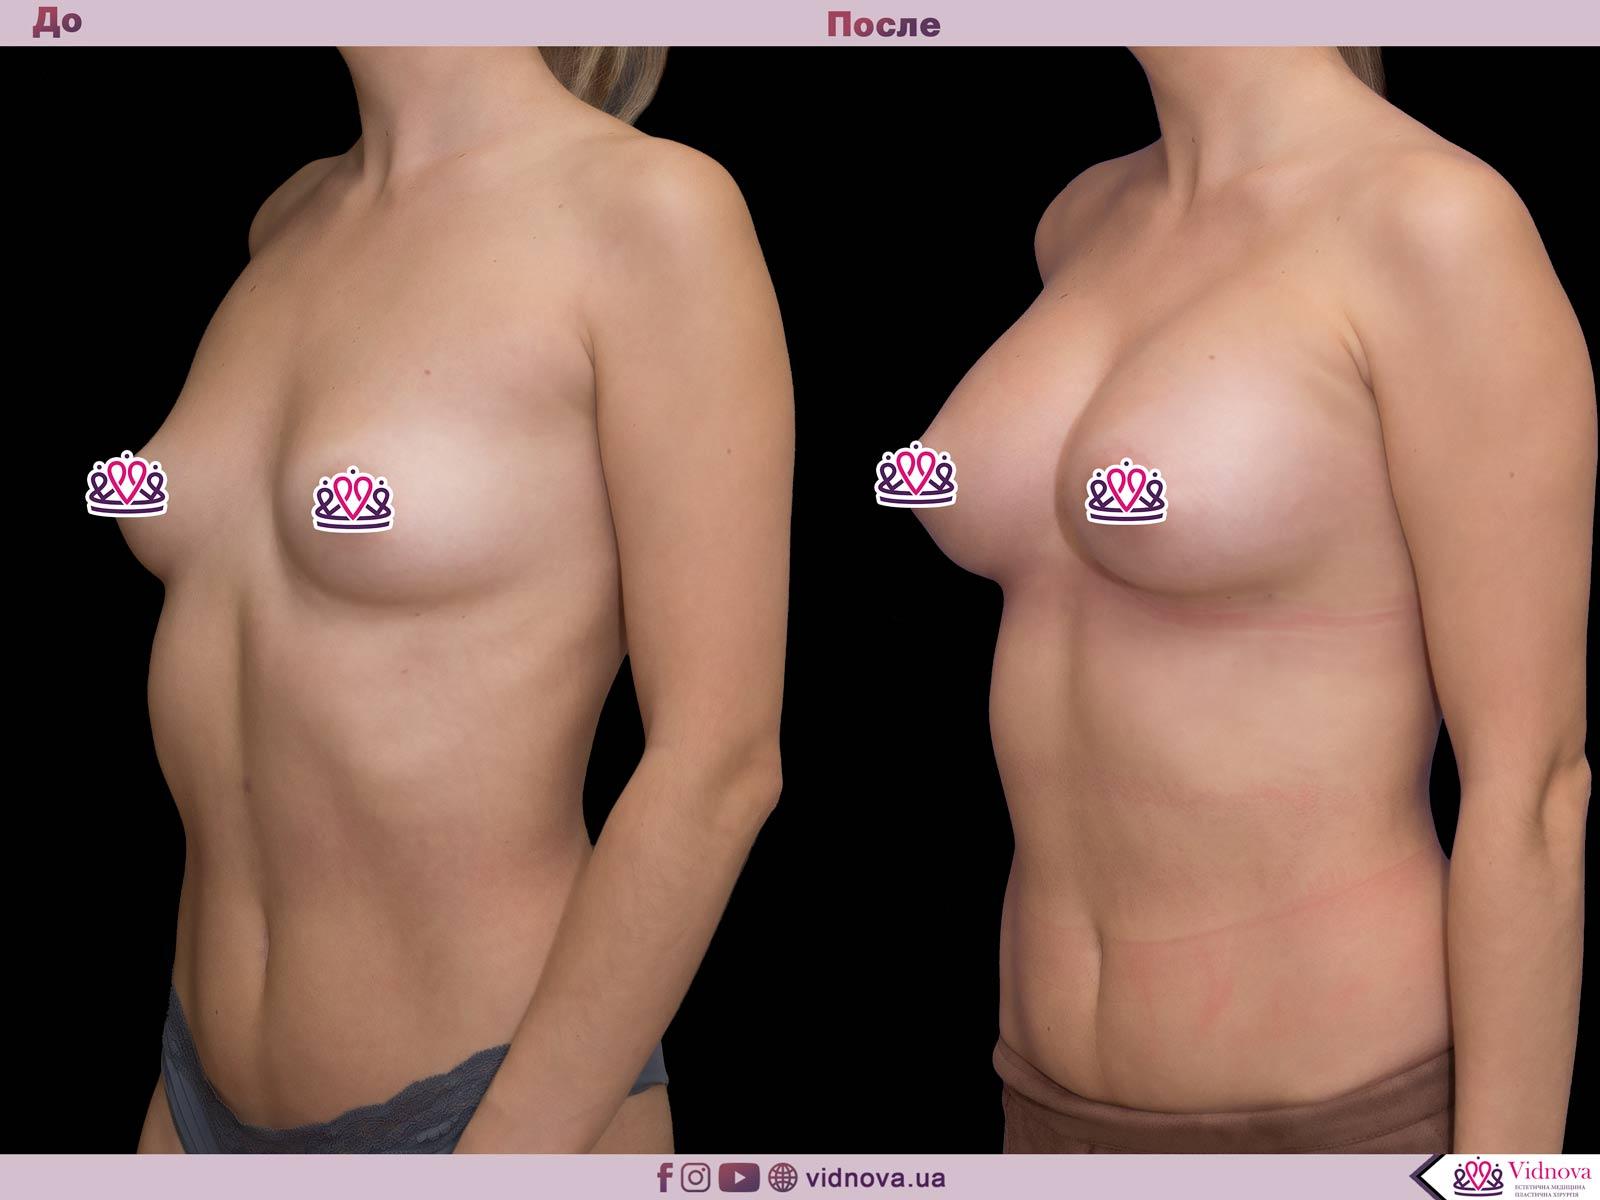 Увеличение груди: Фото ДО и ПОСЛЕ - Пример №34-2 - Клиника Vidnova